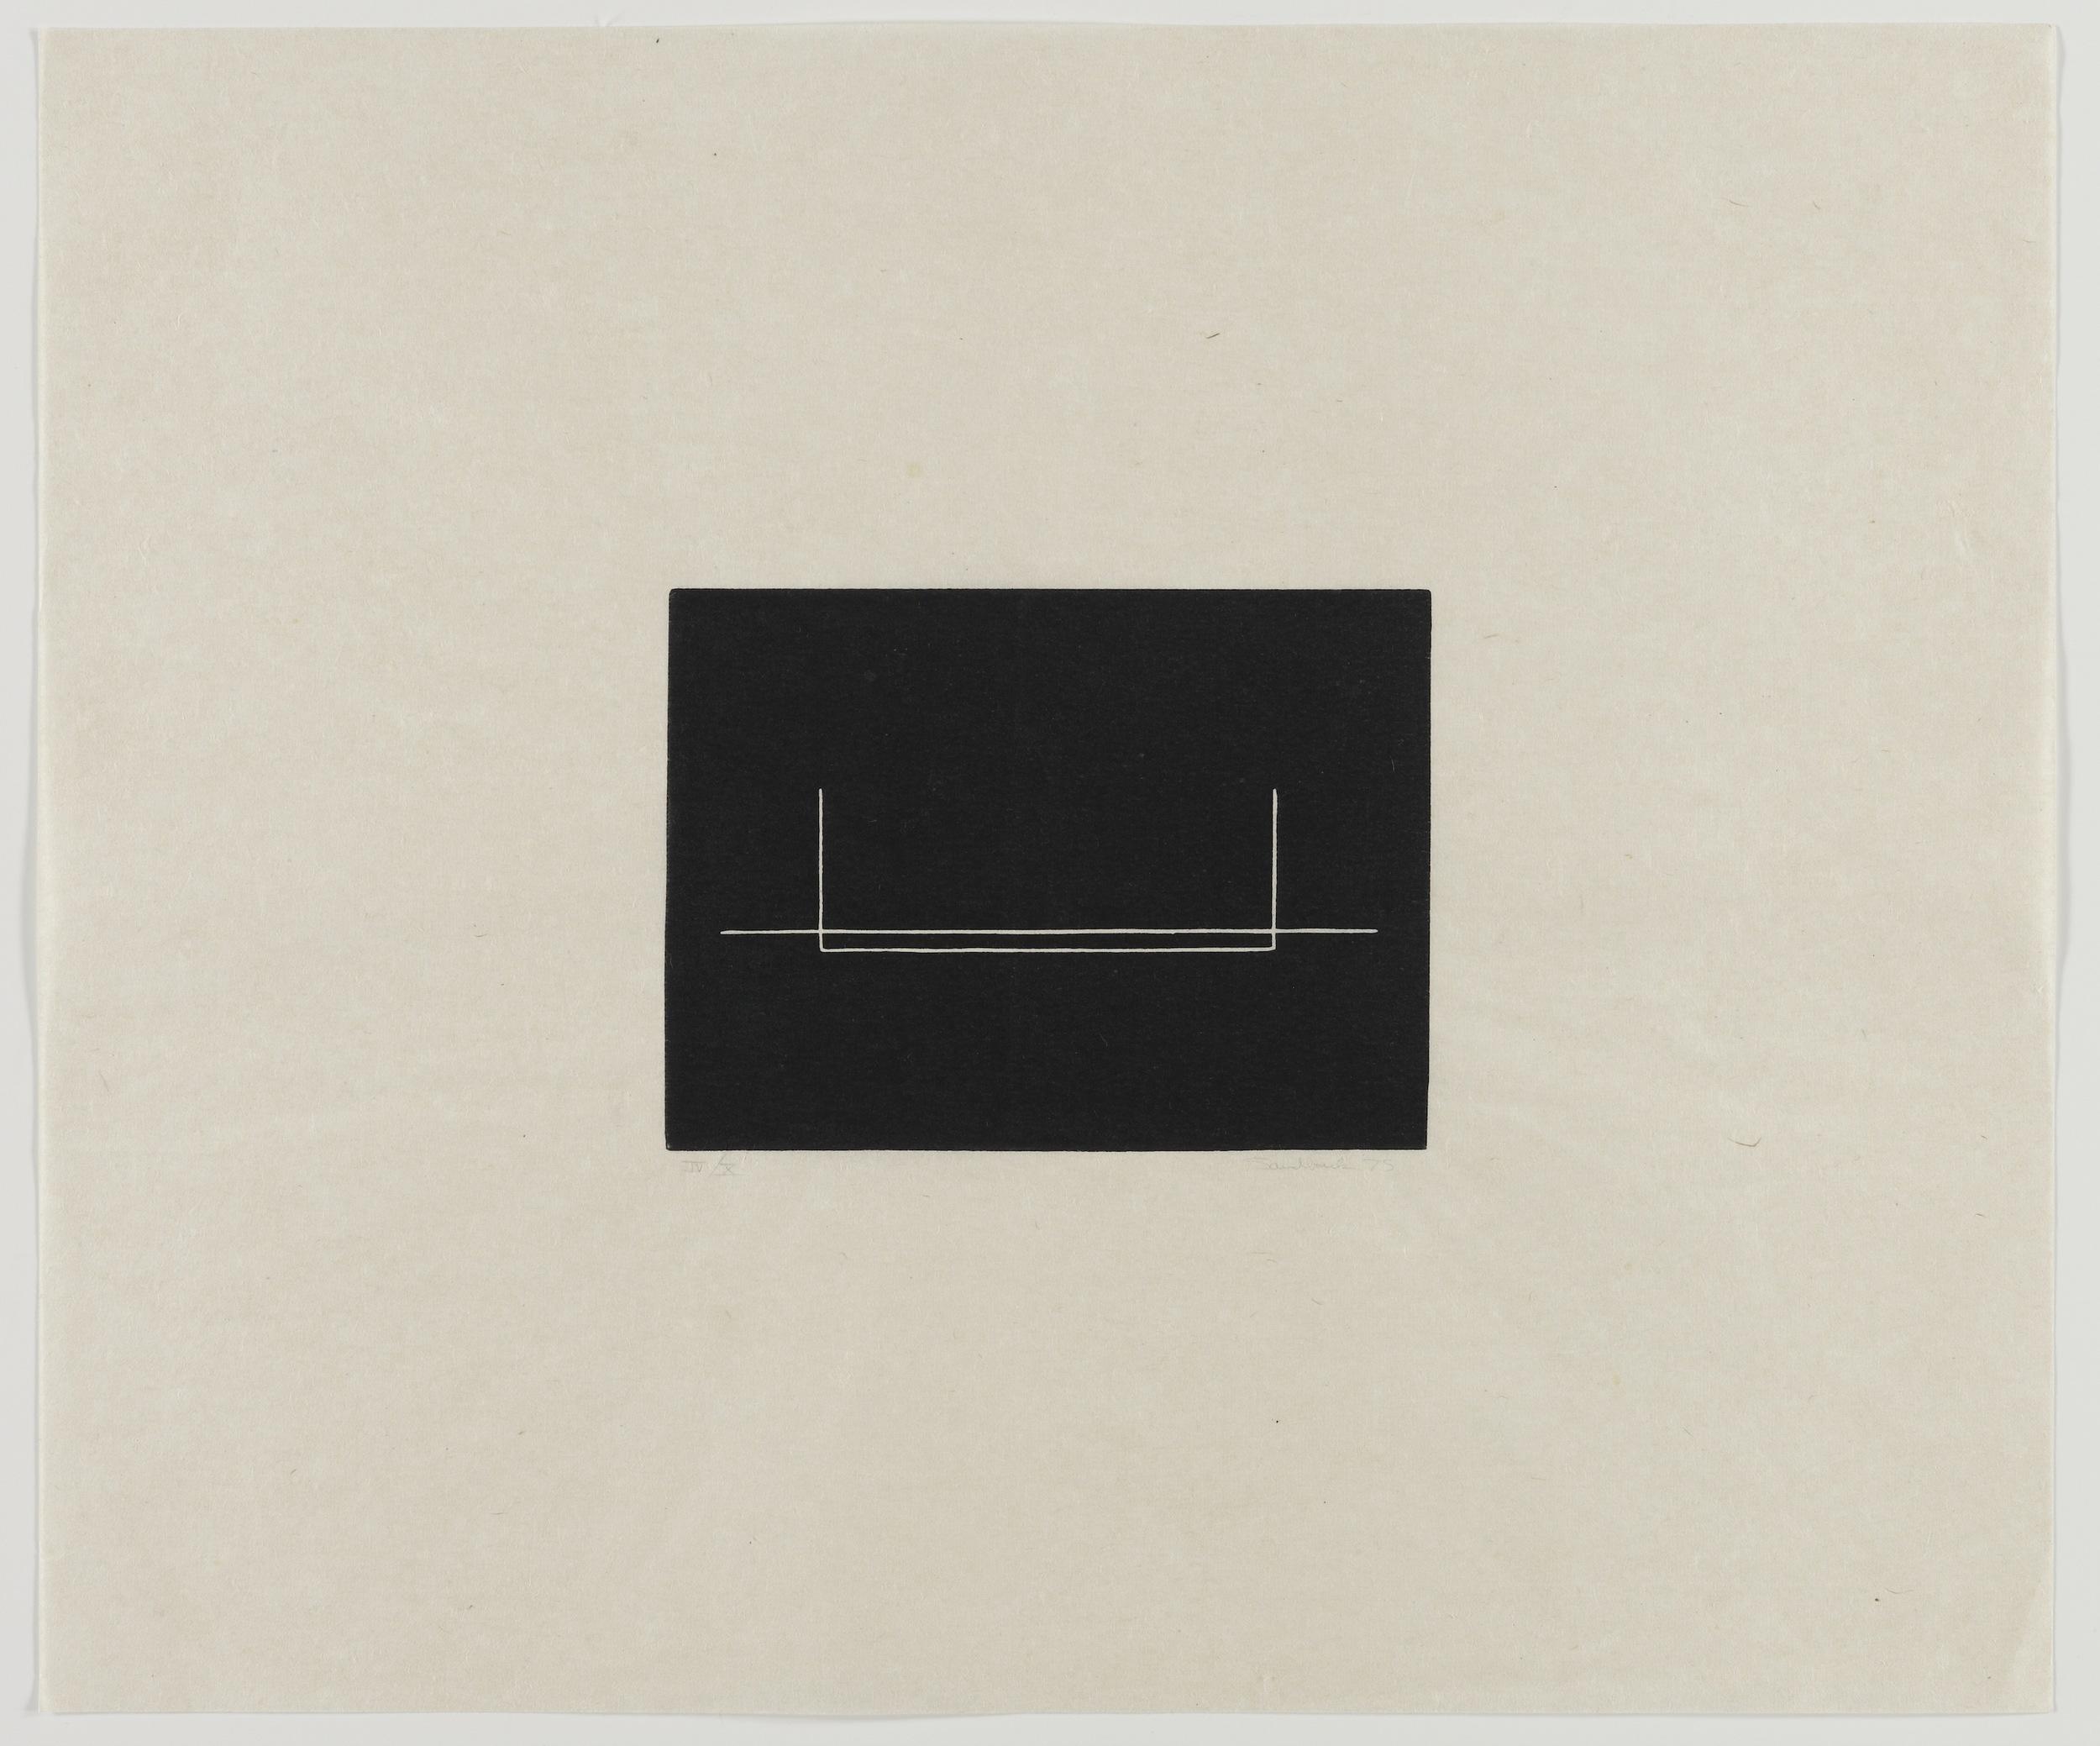 Fred Sandback, Untitled, 1975, Linocut on paper